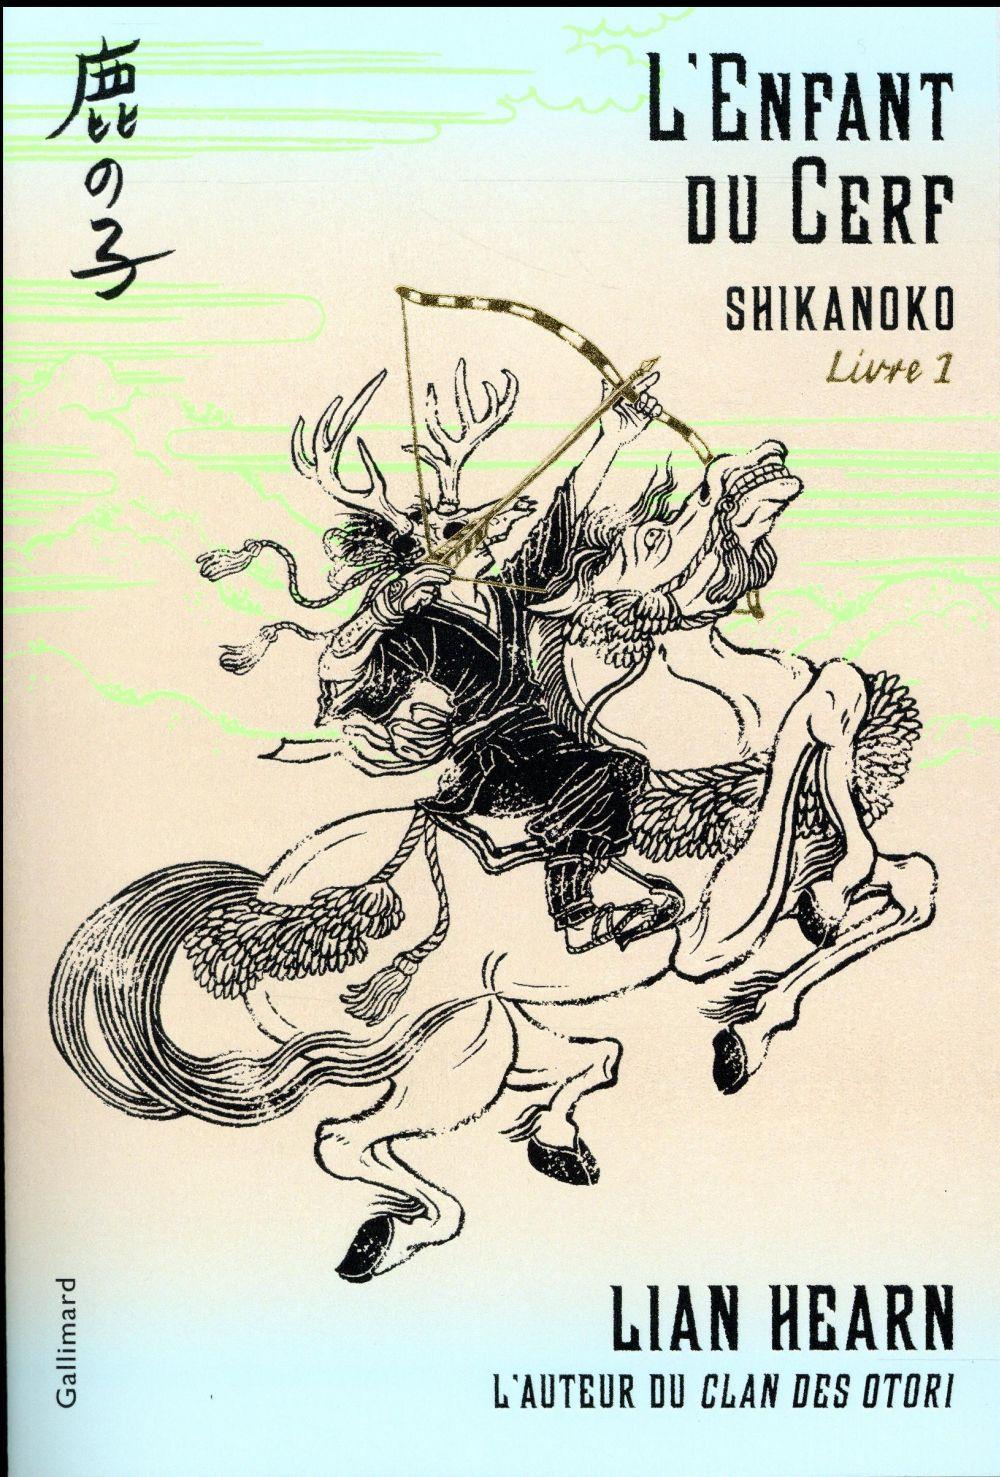 SHIKANOKO, 1 : L'ENFANT DU CERF HEARN LIAN Gallimard-Jeunesse